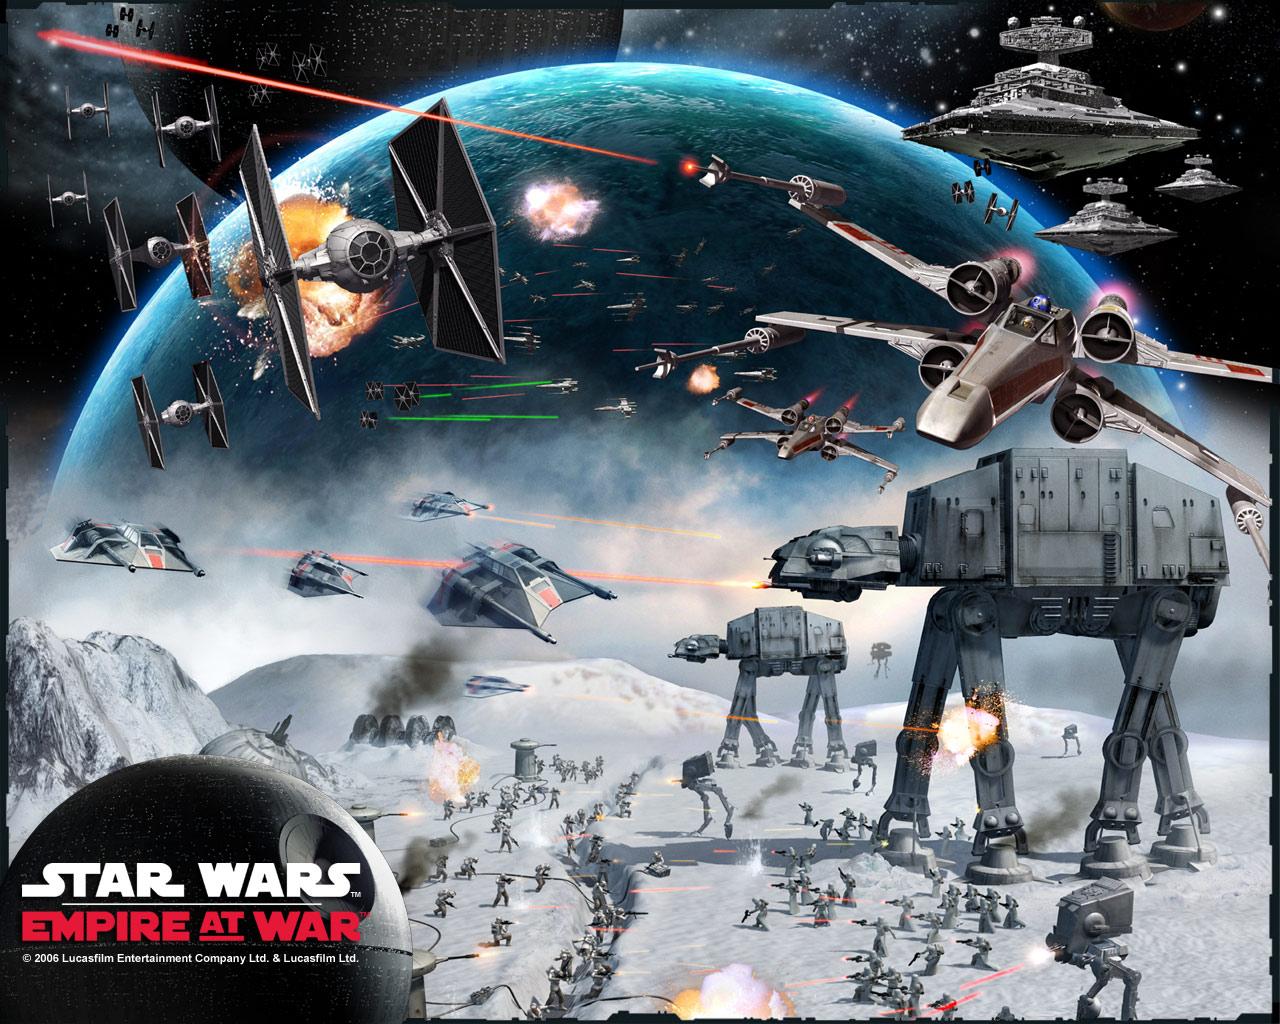 Star Wars Snow Battle Star Wars Wallpaper 1280x1024